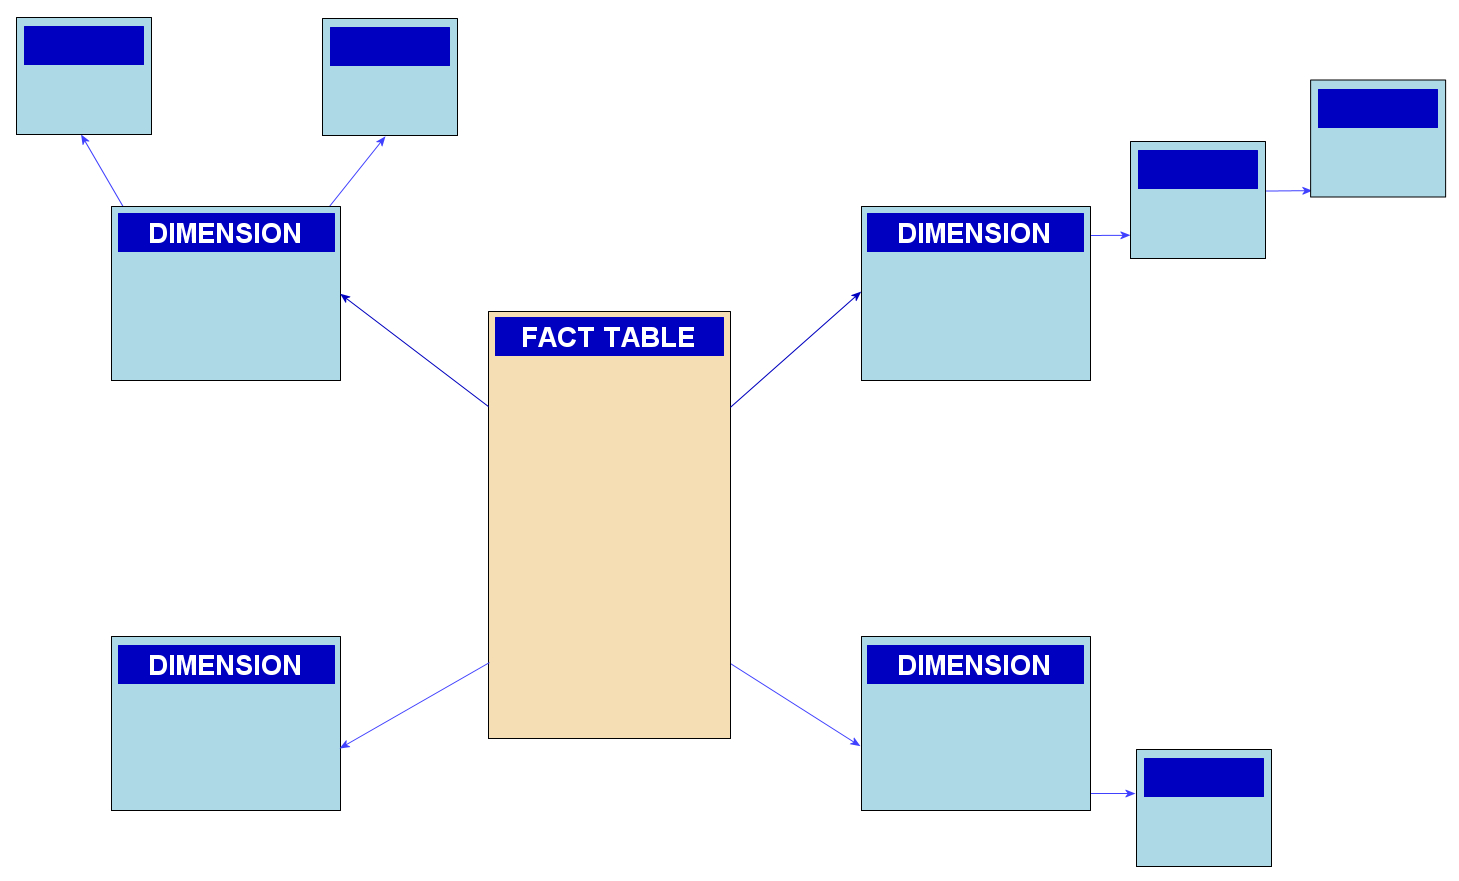 visio database model diagram template wiring for 2003 dodge ram 2500 snowflake schema - wikipedia